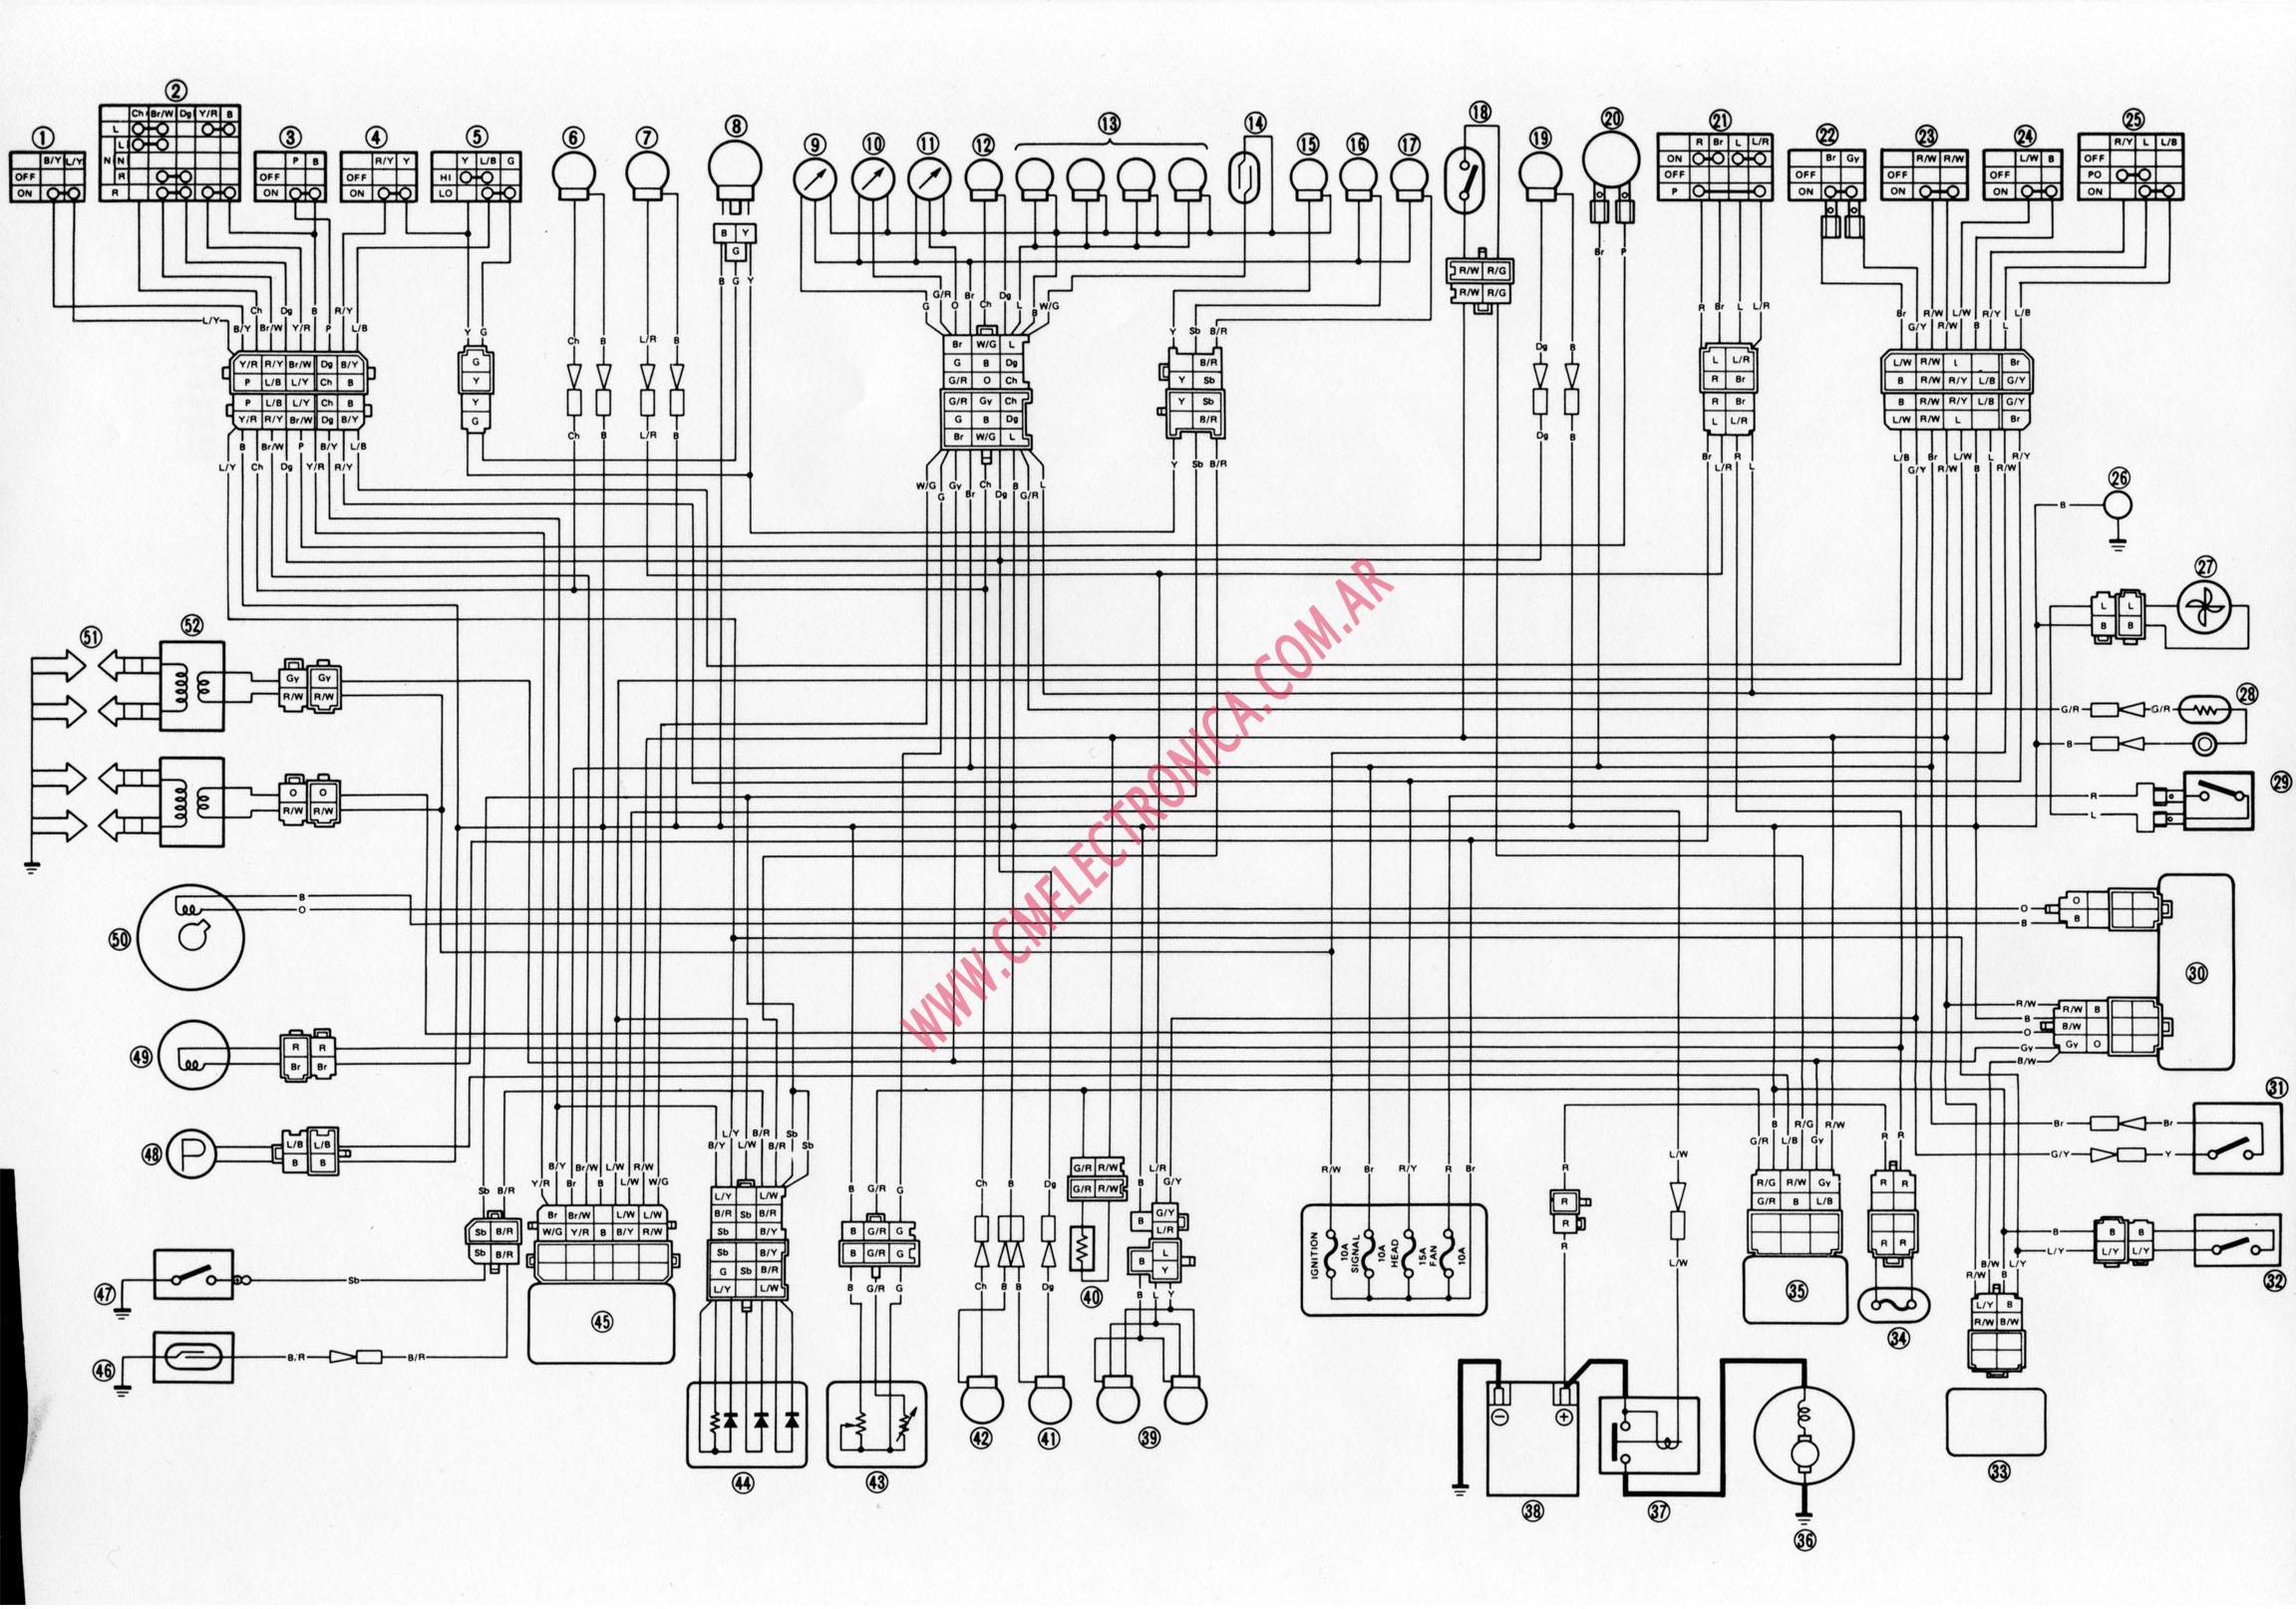 2002 xr650r wiring diagram tree game diagrama yamaha fz750